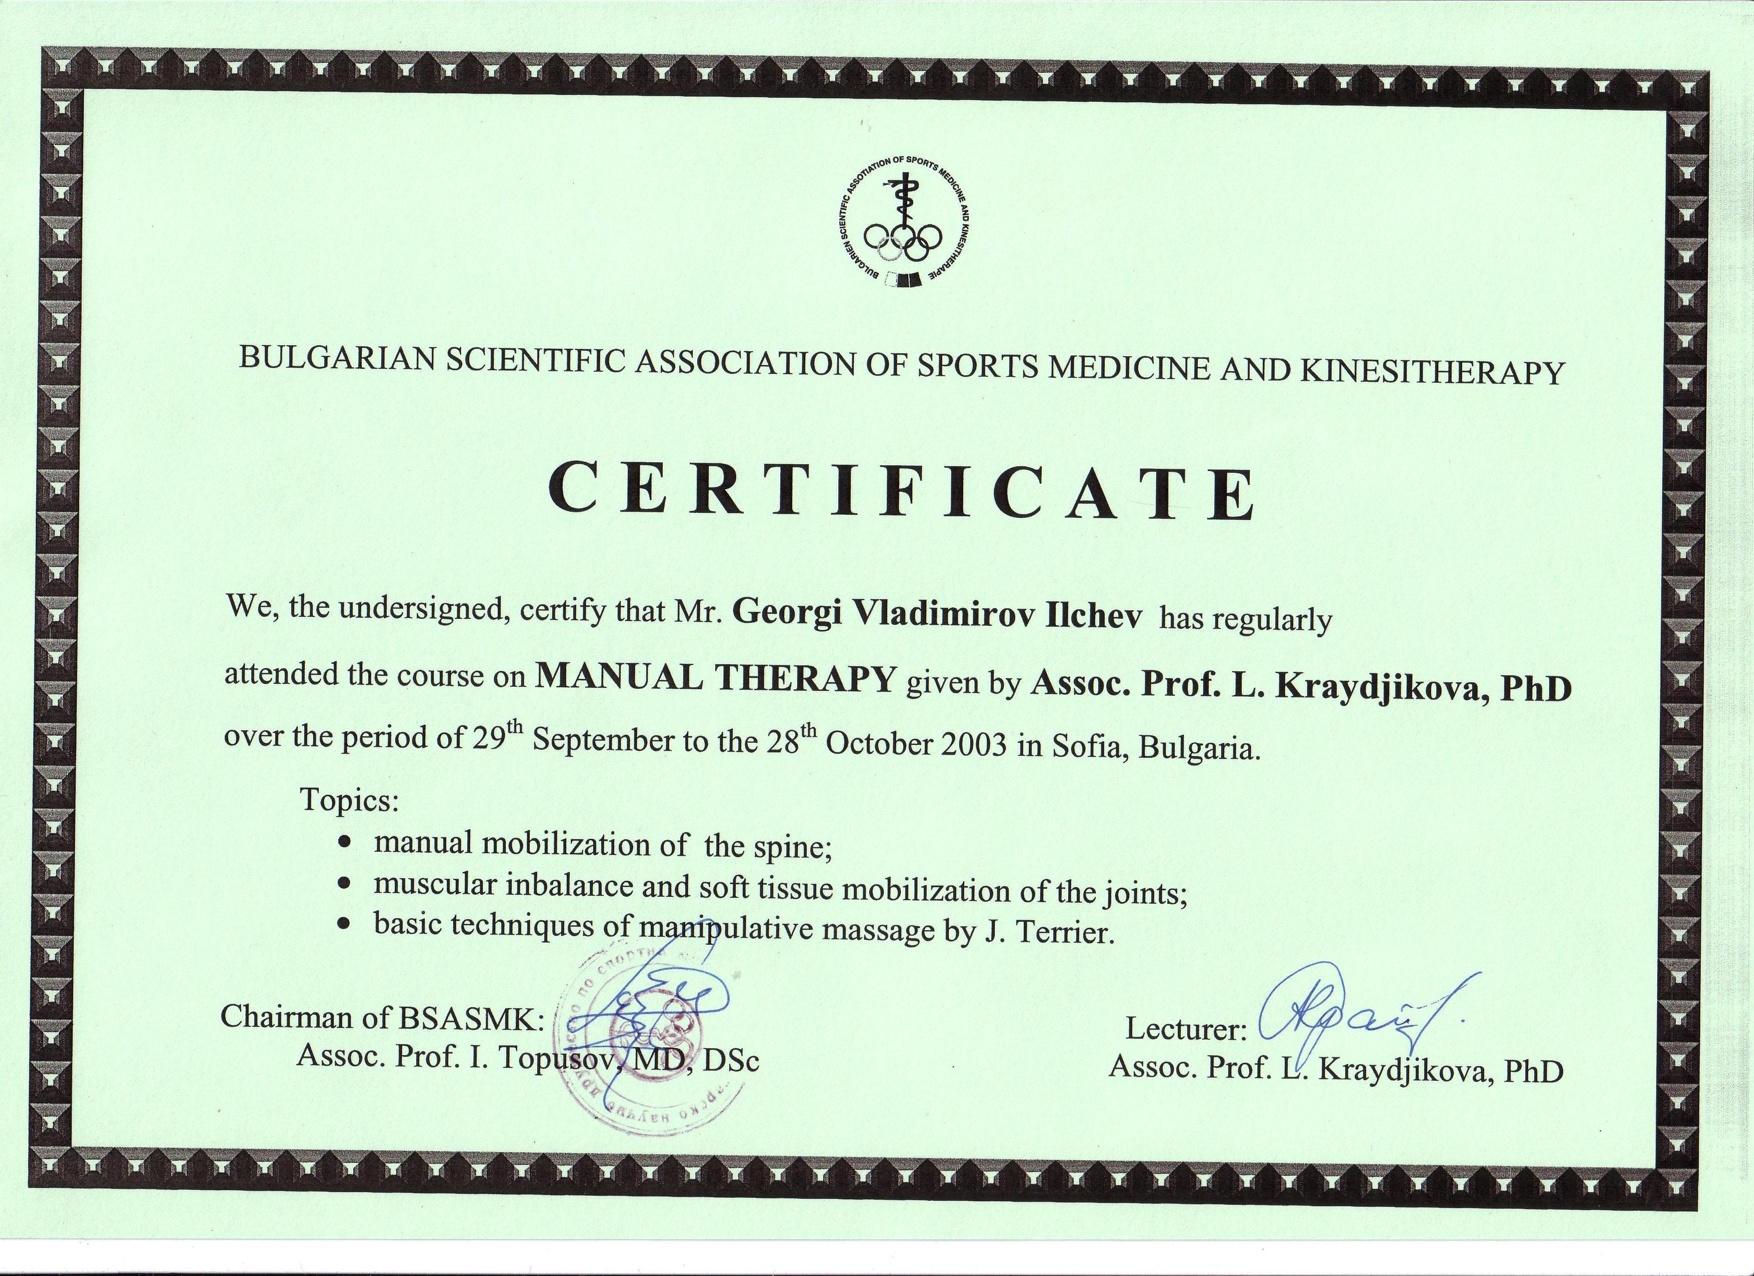 certificate-certificate-j-t-terrier